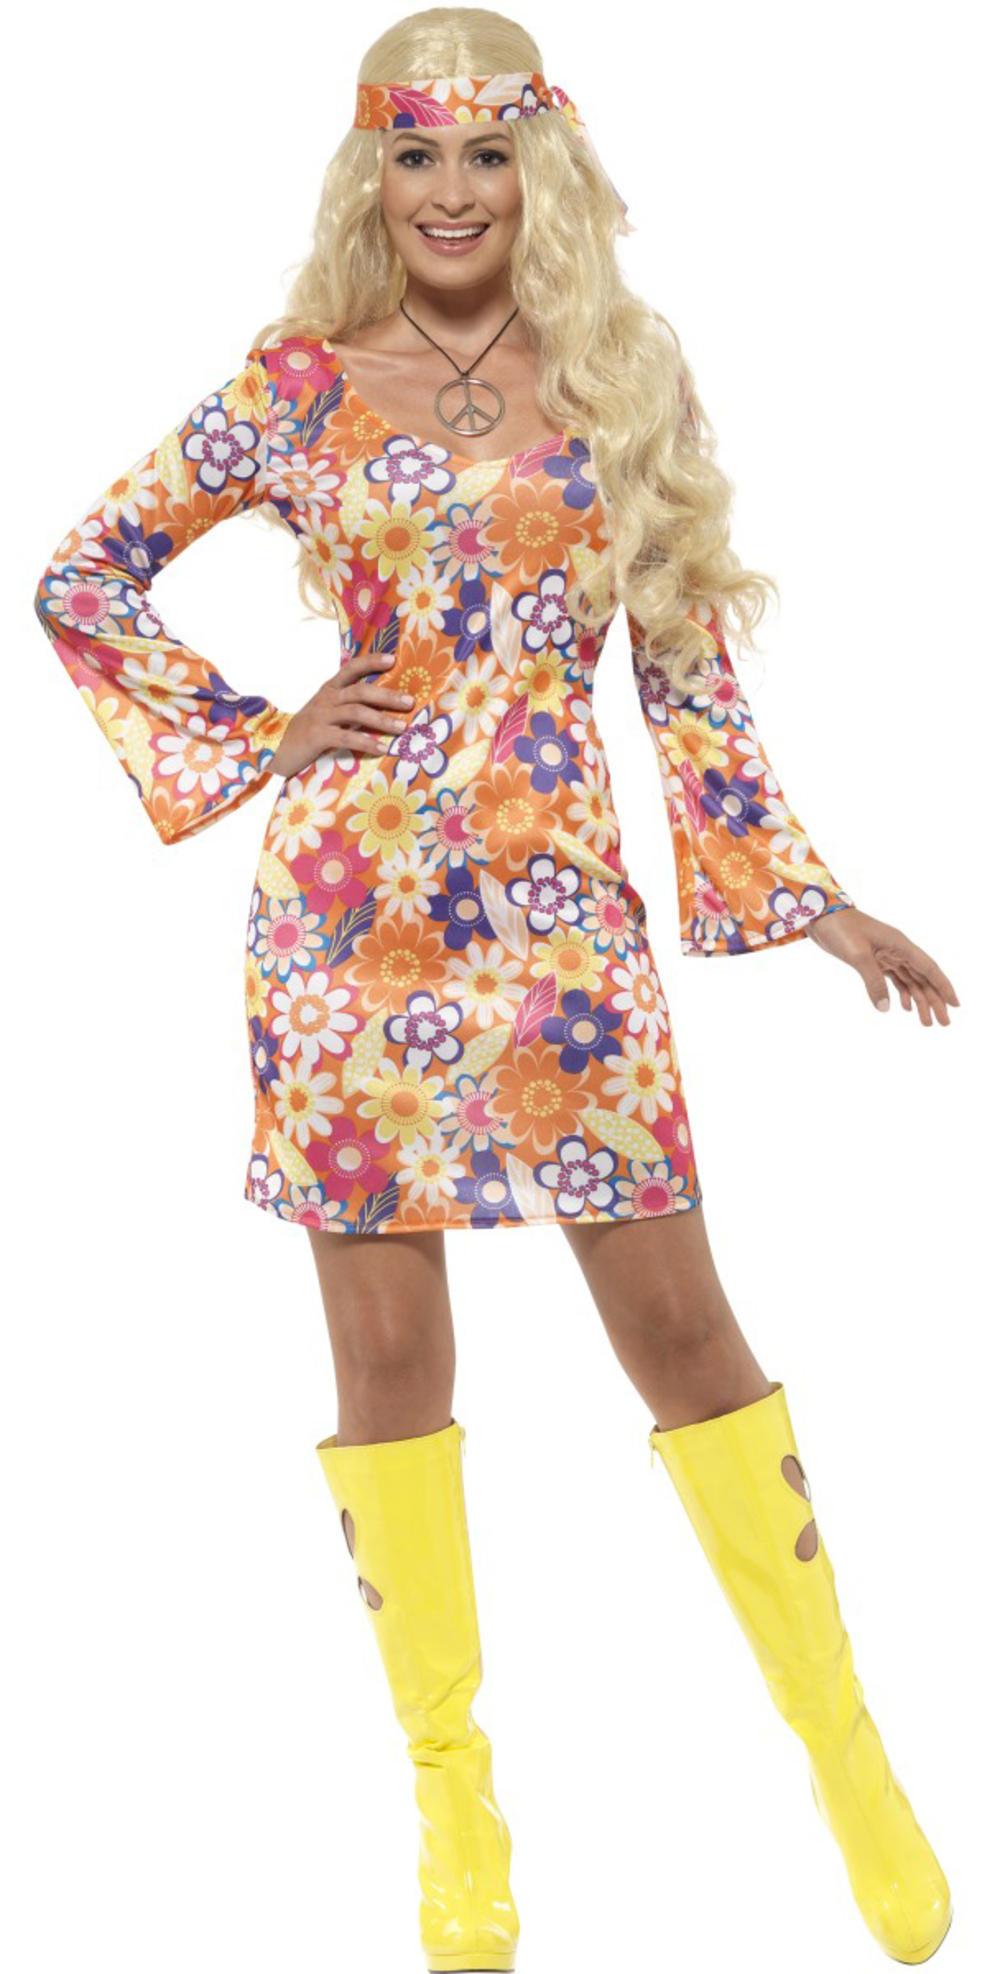 Flower Power Hippie Ladies Fancy Dress 60s 70s Groovy Hippy Adult Womens Costume